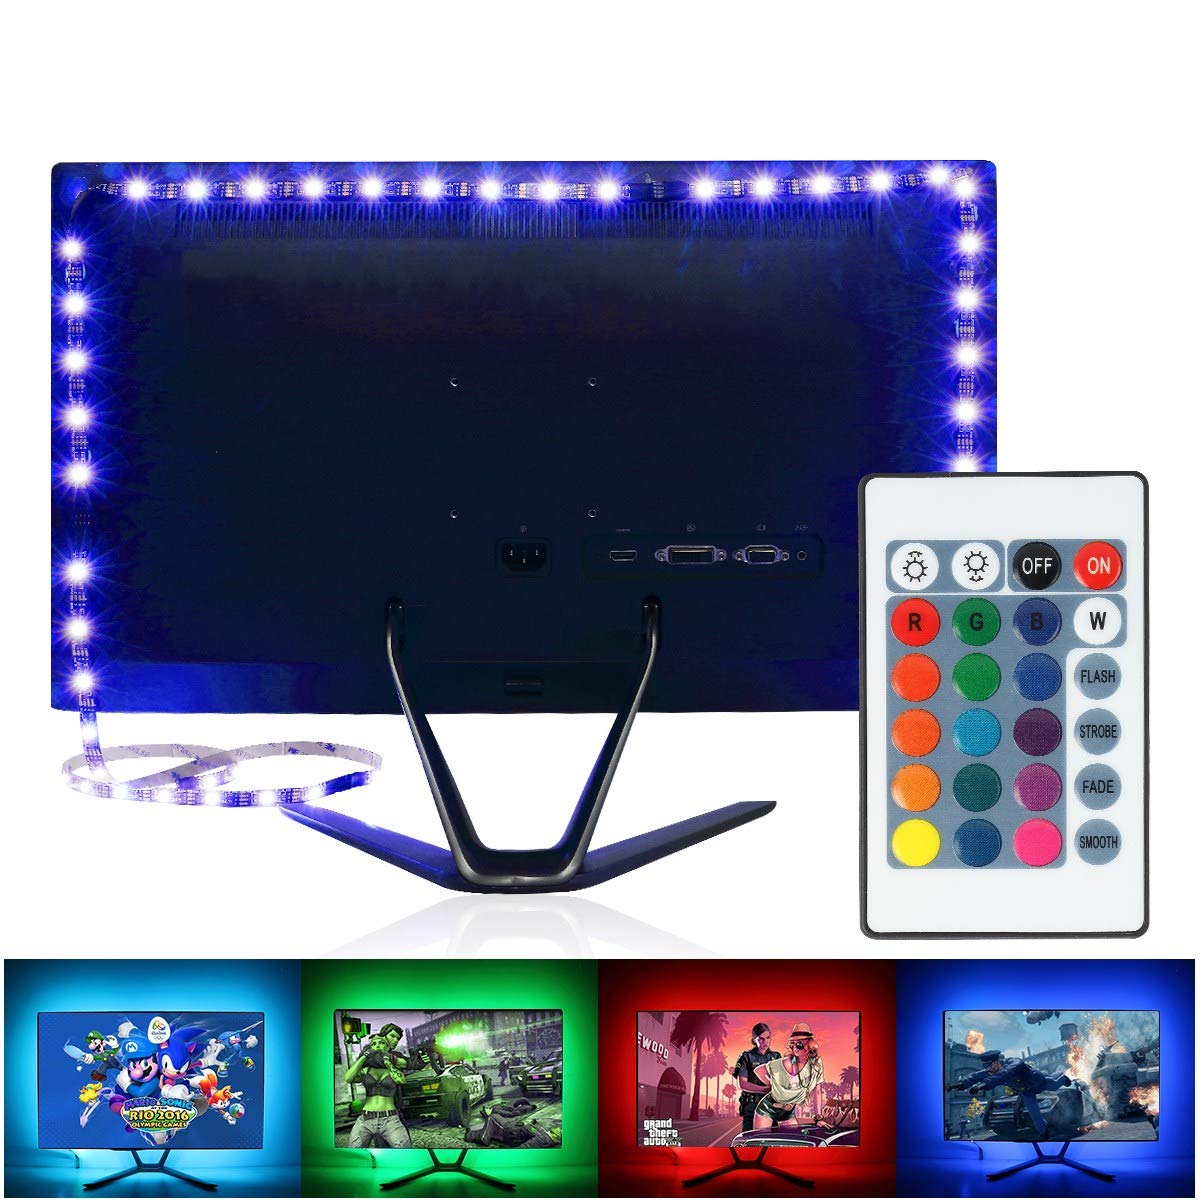 VXVLD LED Strip Lights LED TV Backlight 2M/6.56ft RGB Neon Accent LED Lights Strips for 40 to 60 in HDTV Neon Light Bias Lighting with Remote, USB LED Strips for TV Backlight